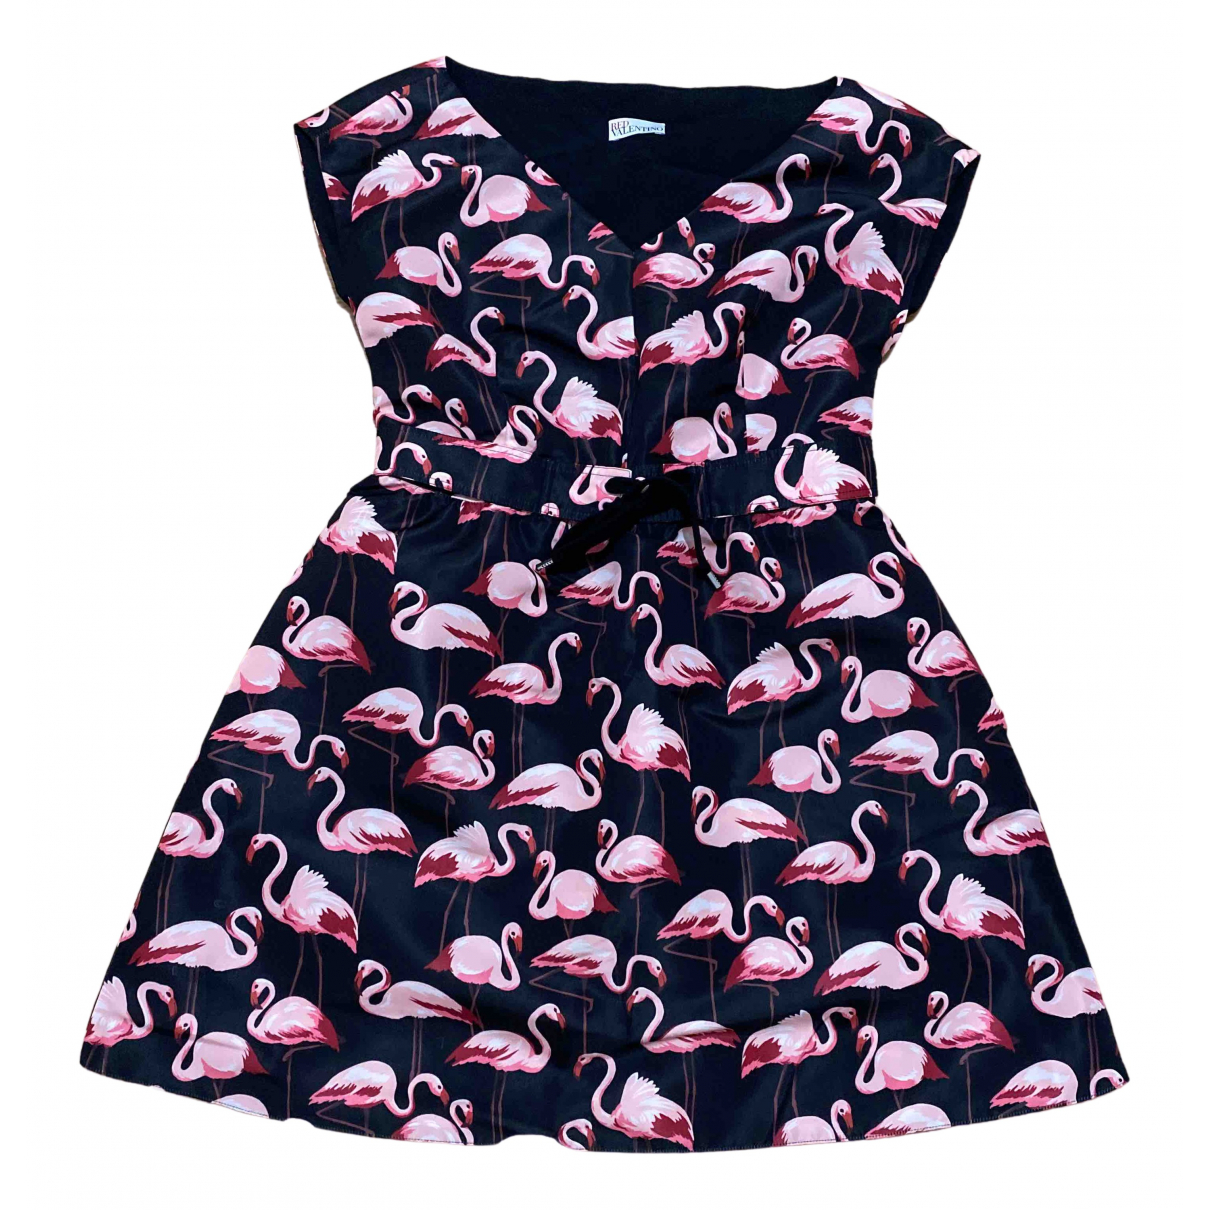 Red Valentino Garavani \N Black dress for Women 44 IT